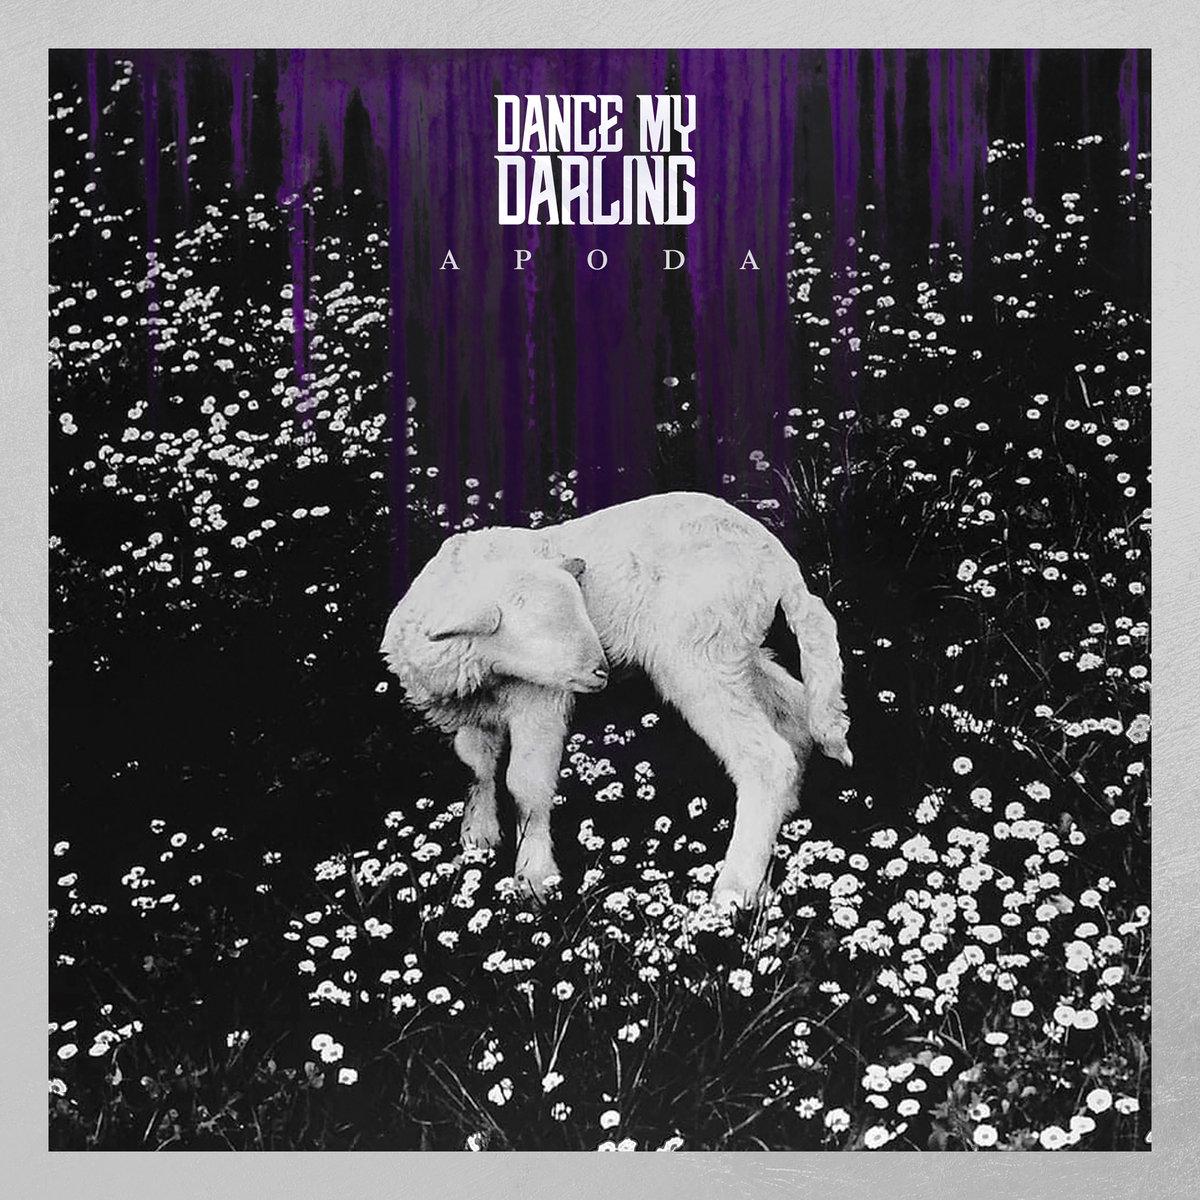 Dance My Darling - Apoda - Dance My Darling - Apoda